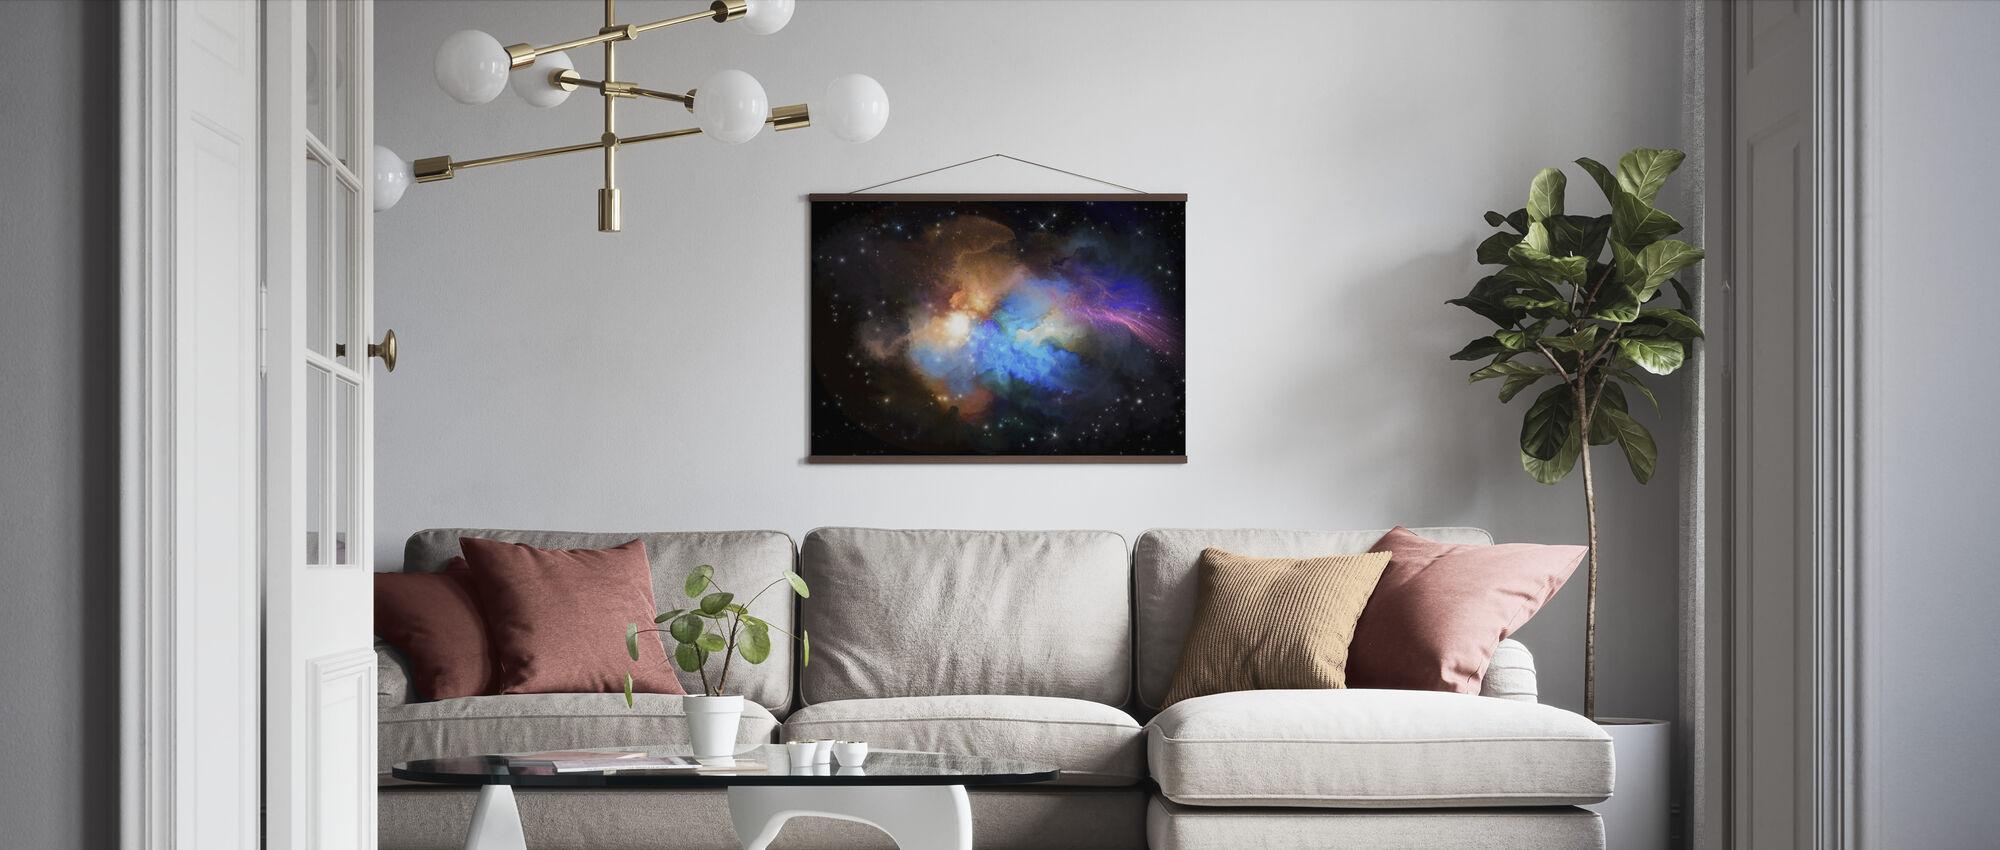 Multicolored Nebula - Poster - Living Room